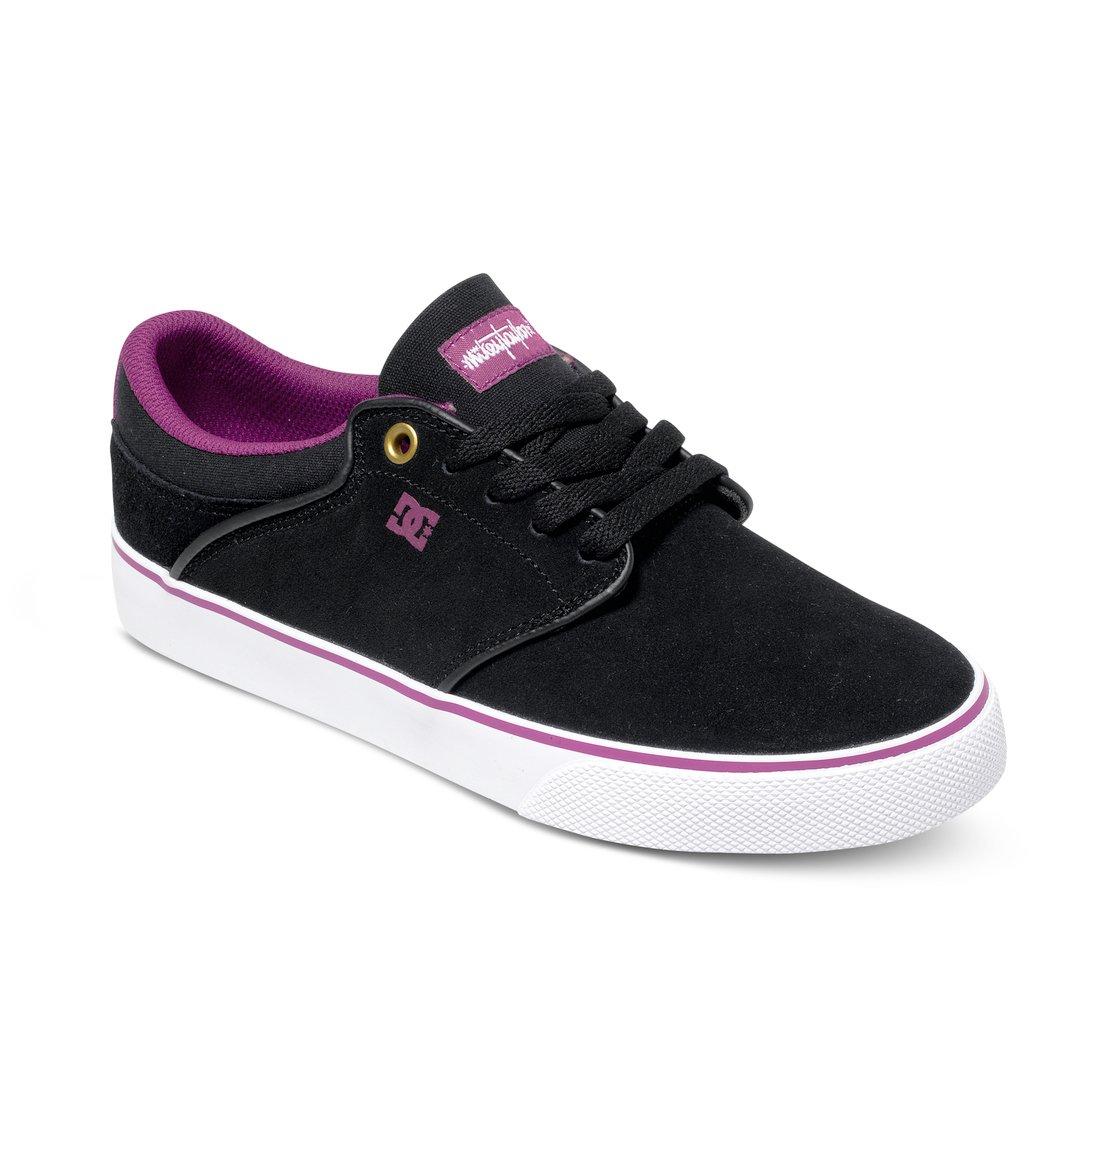 Купить Обувь для скейтборда   Mikey Taylor Vulc